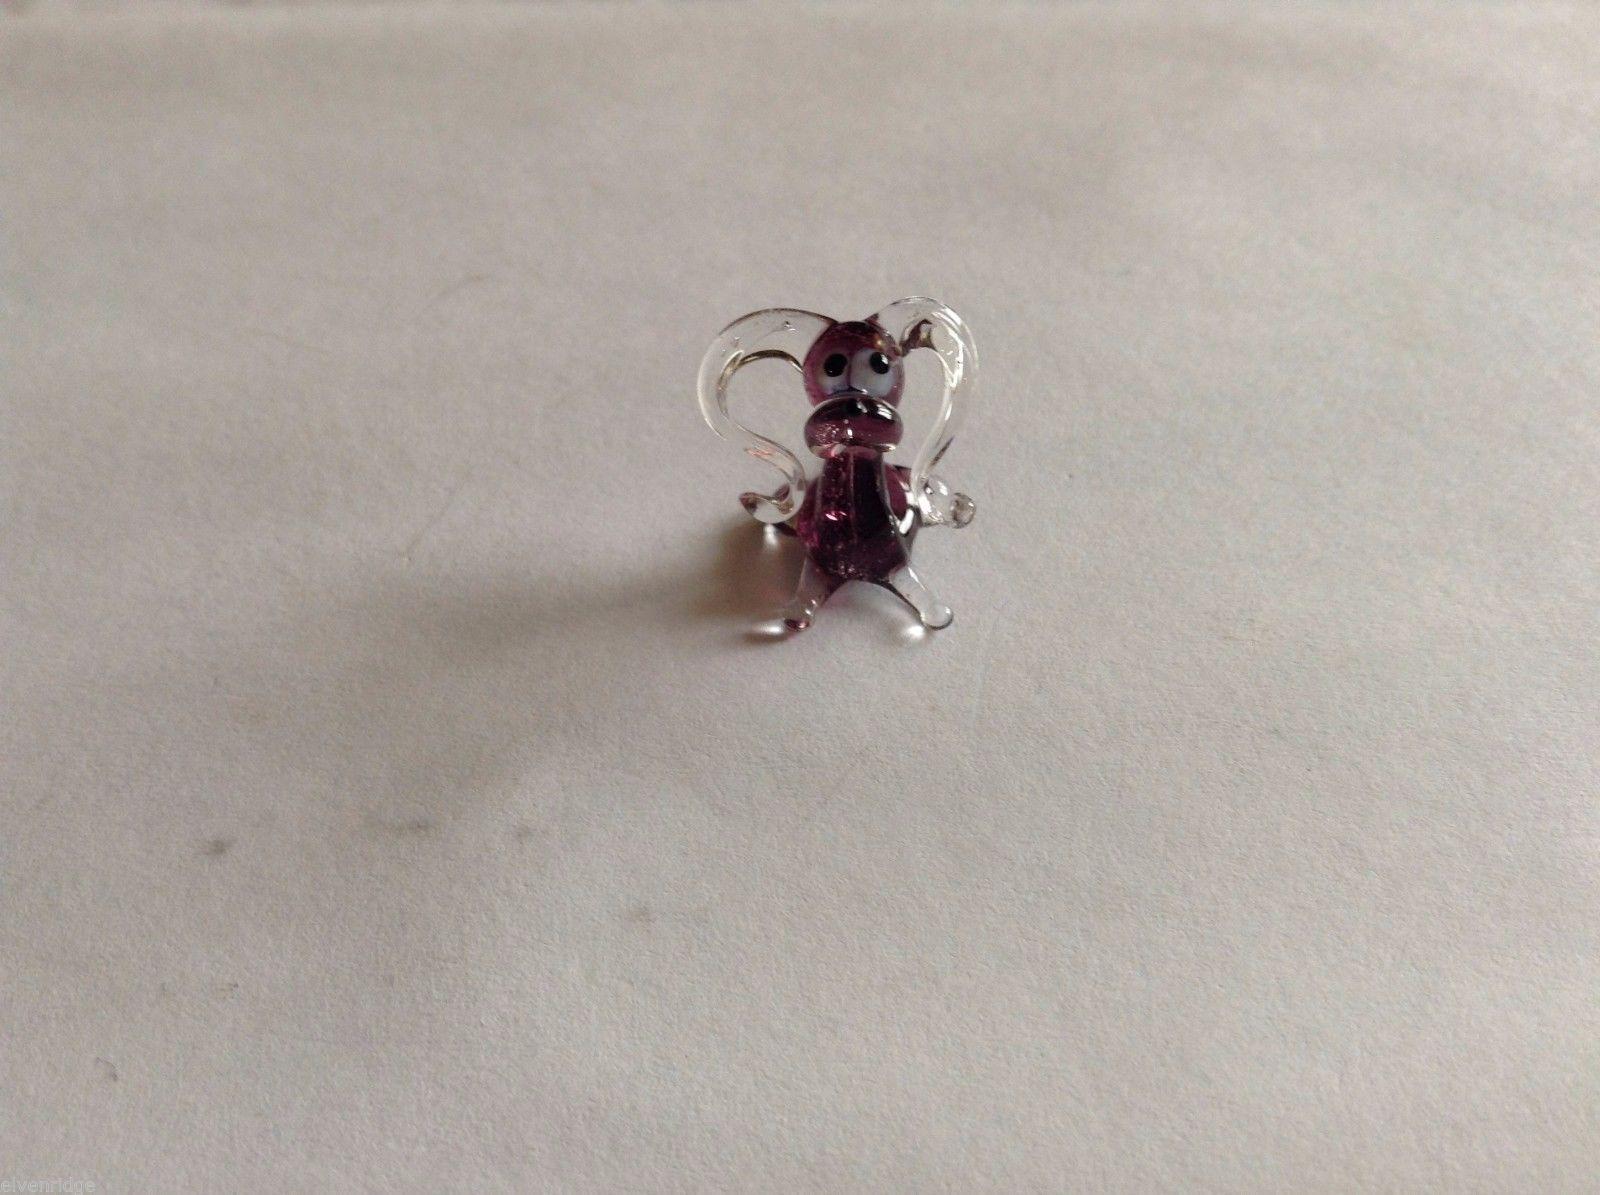 Micro Miniature hand blown glass made USA NIB  silly clear purple dog floppy ear